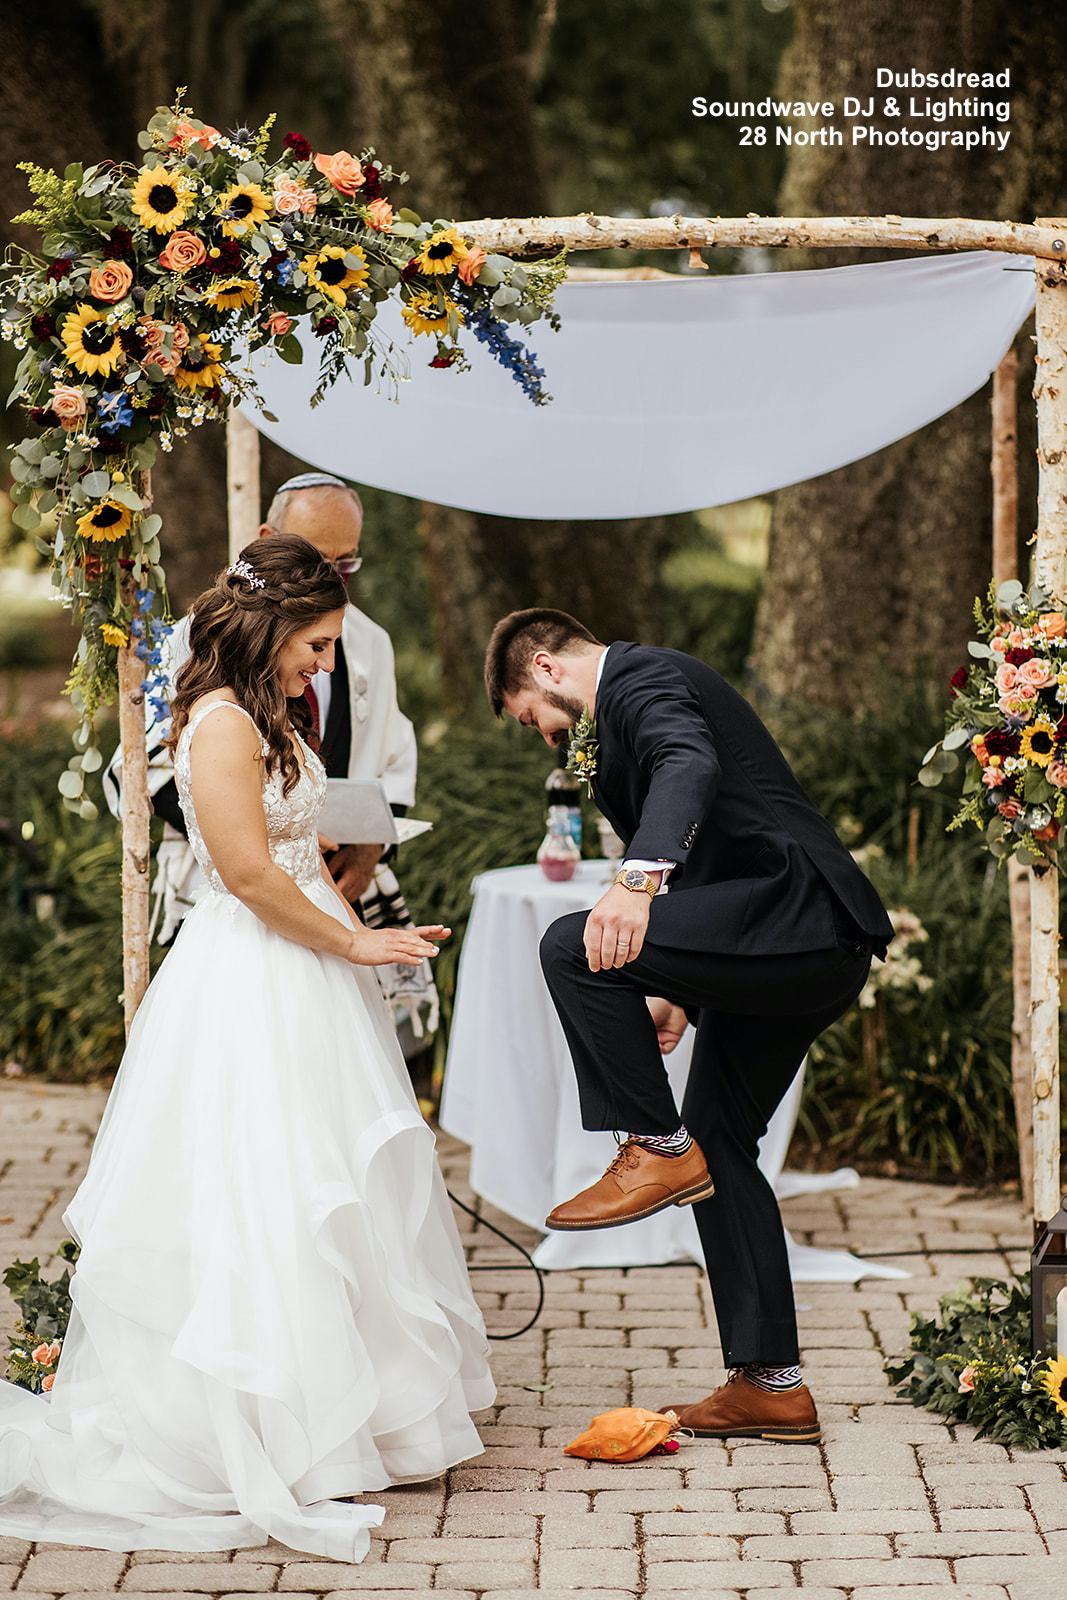 Dubsdread Soundwave Wedding Jewish